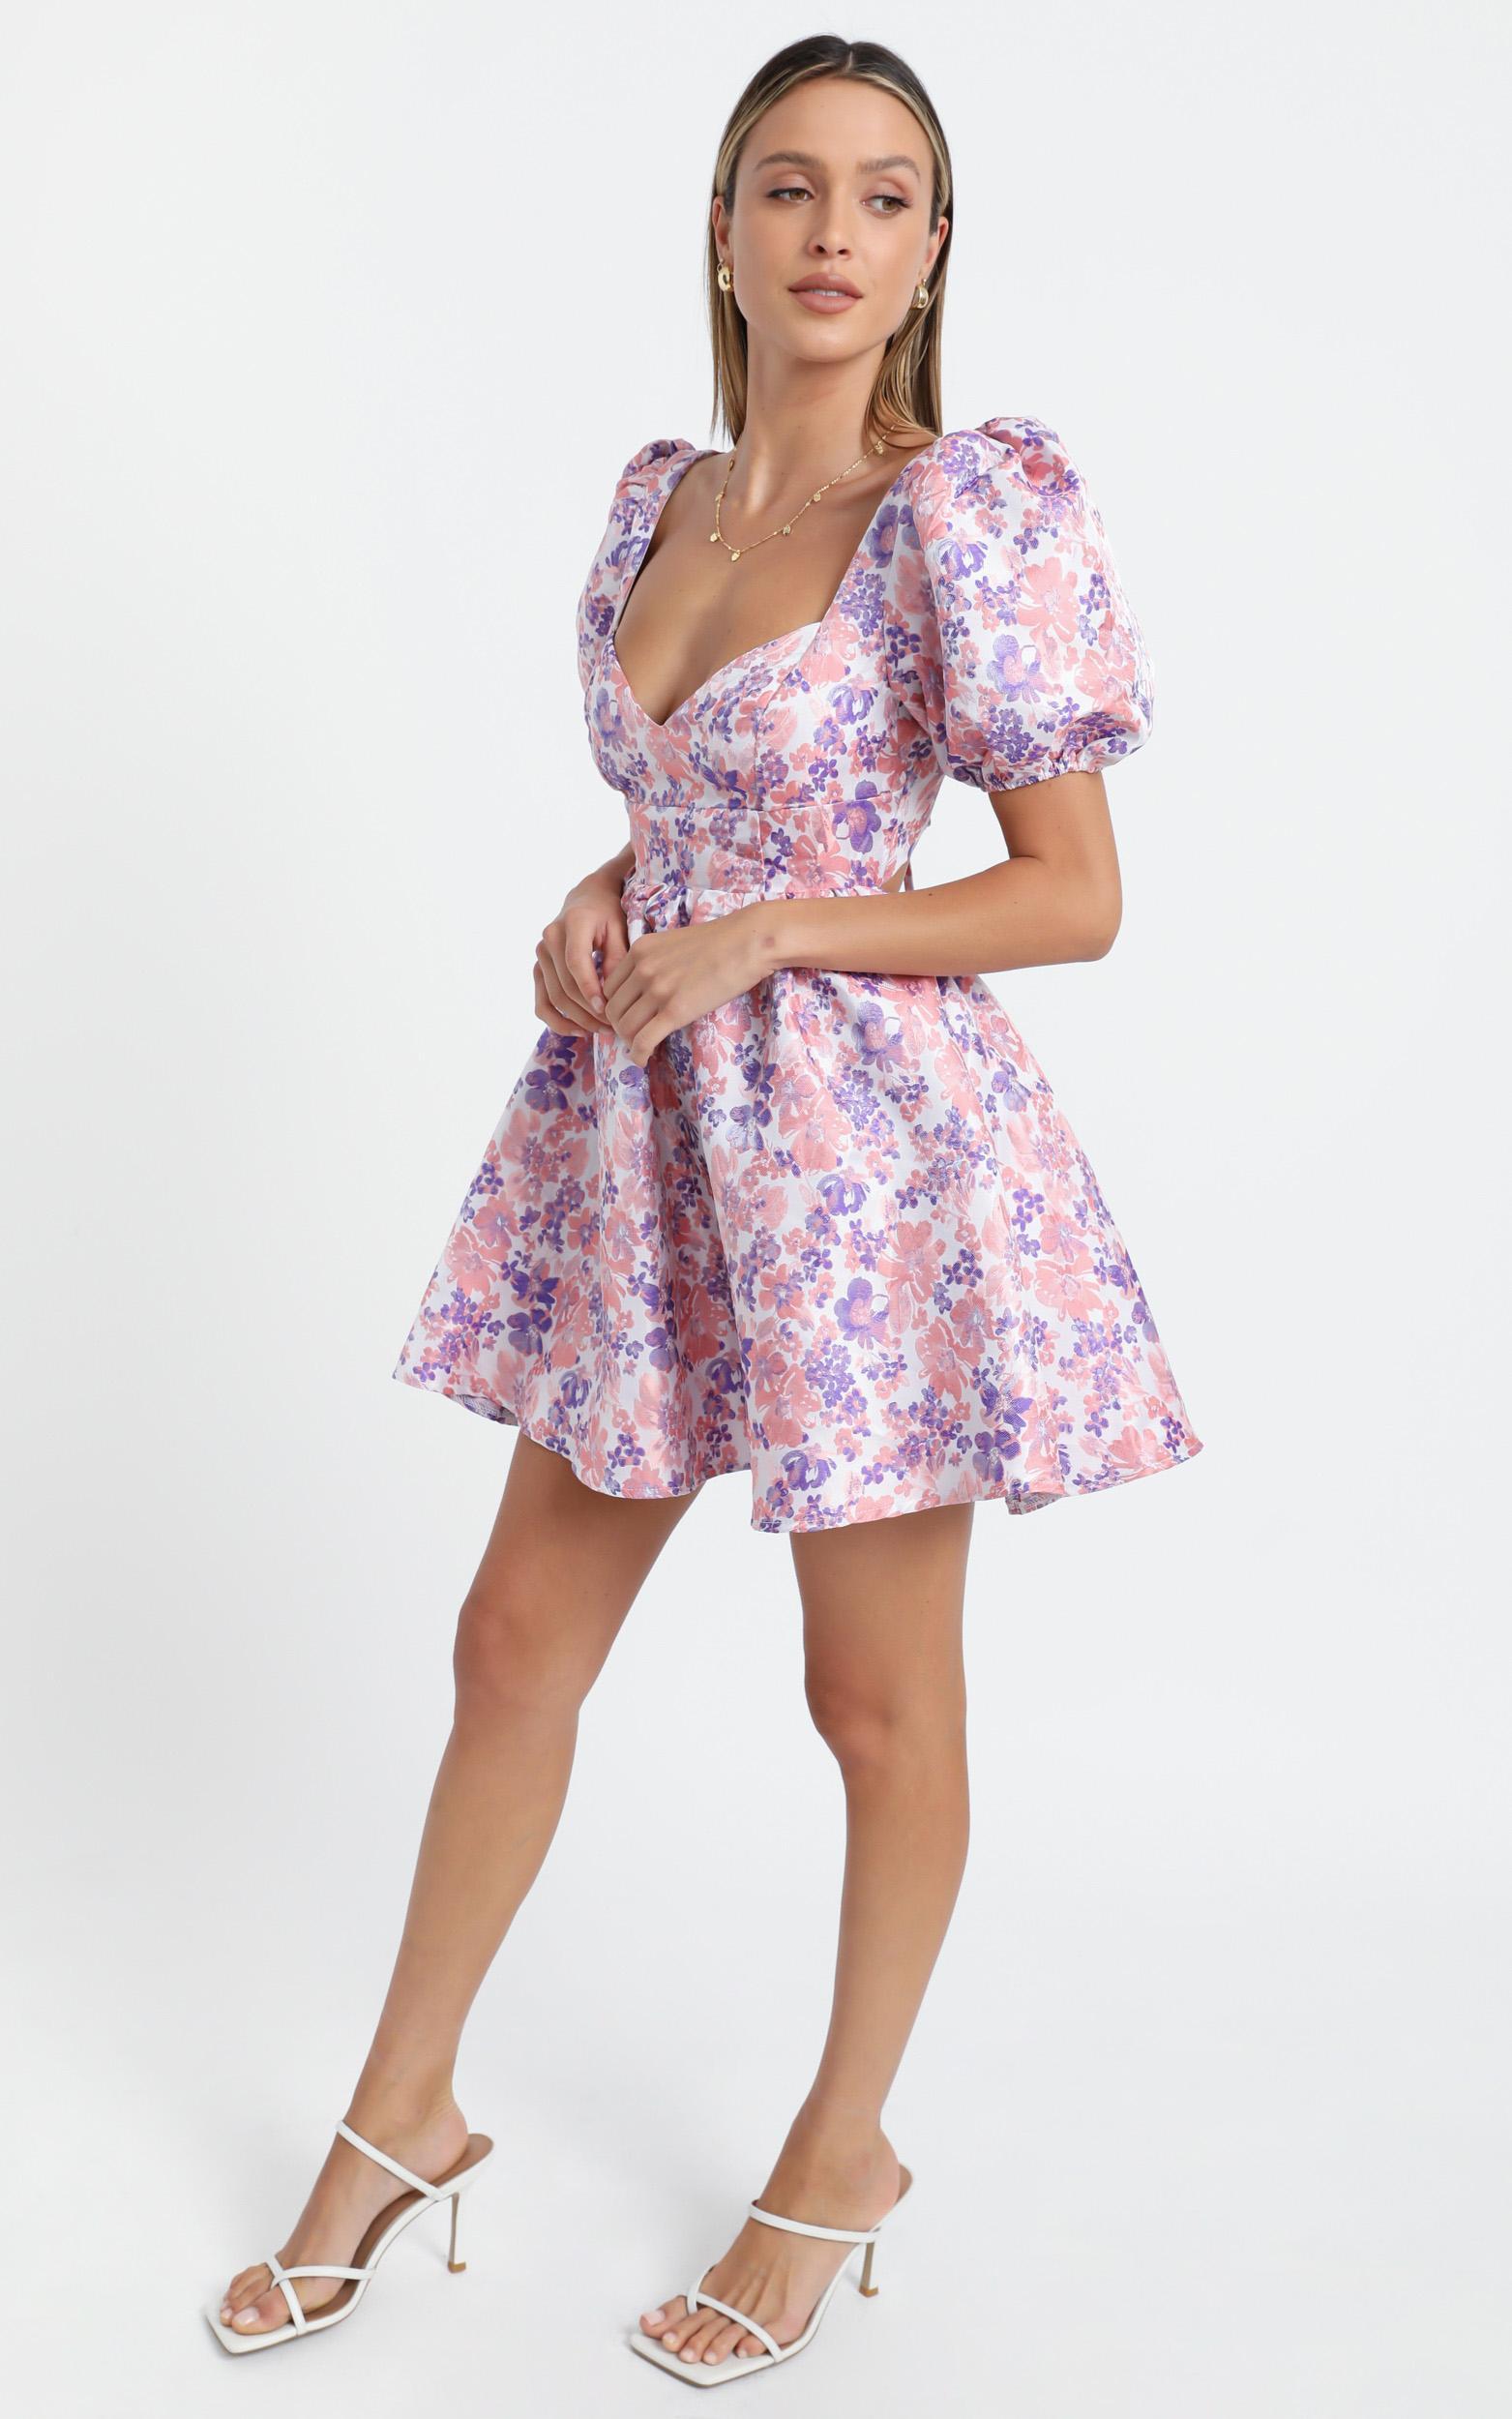 Nicolette Dress in Multi Floral - 6 (XS), Multi, hi-res image number null